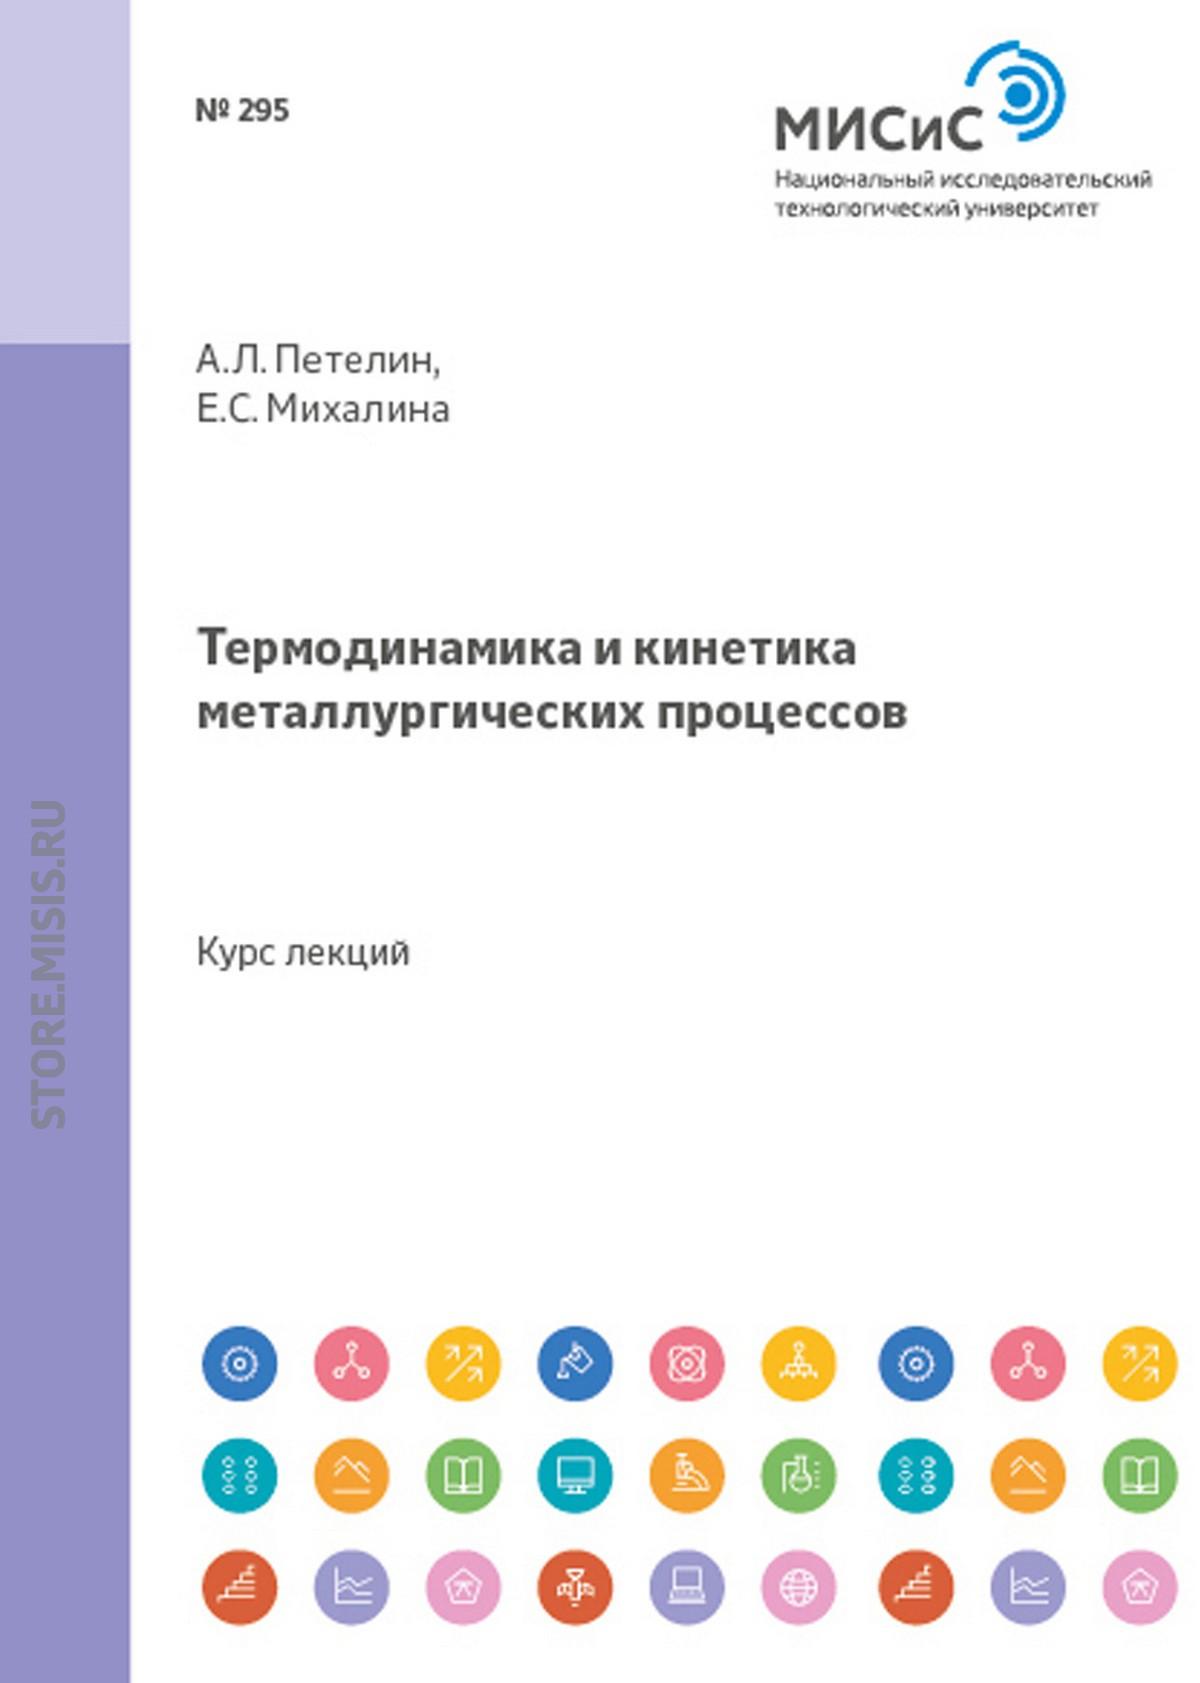 Александр Петелин / Термодинамика и кинетика металлургических процессов